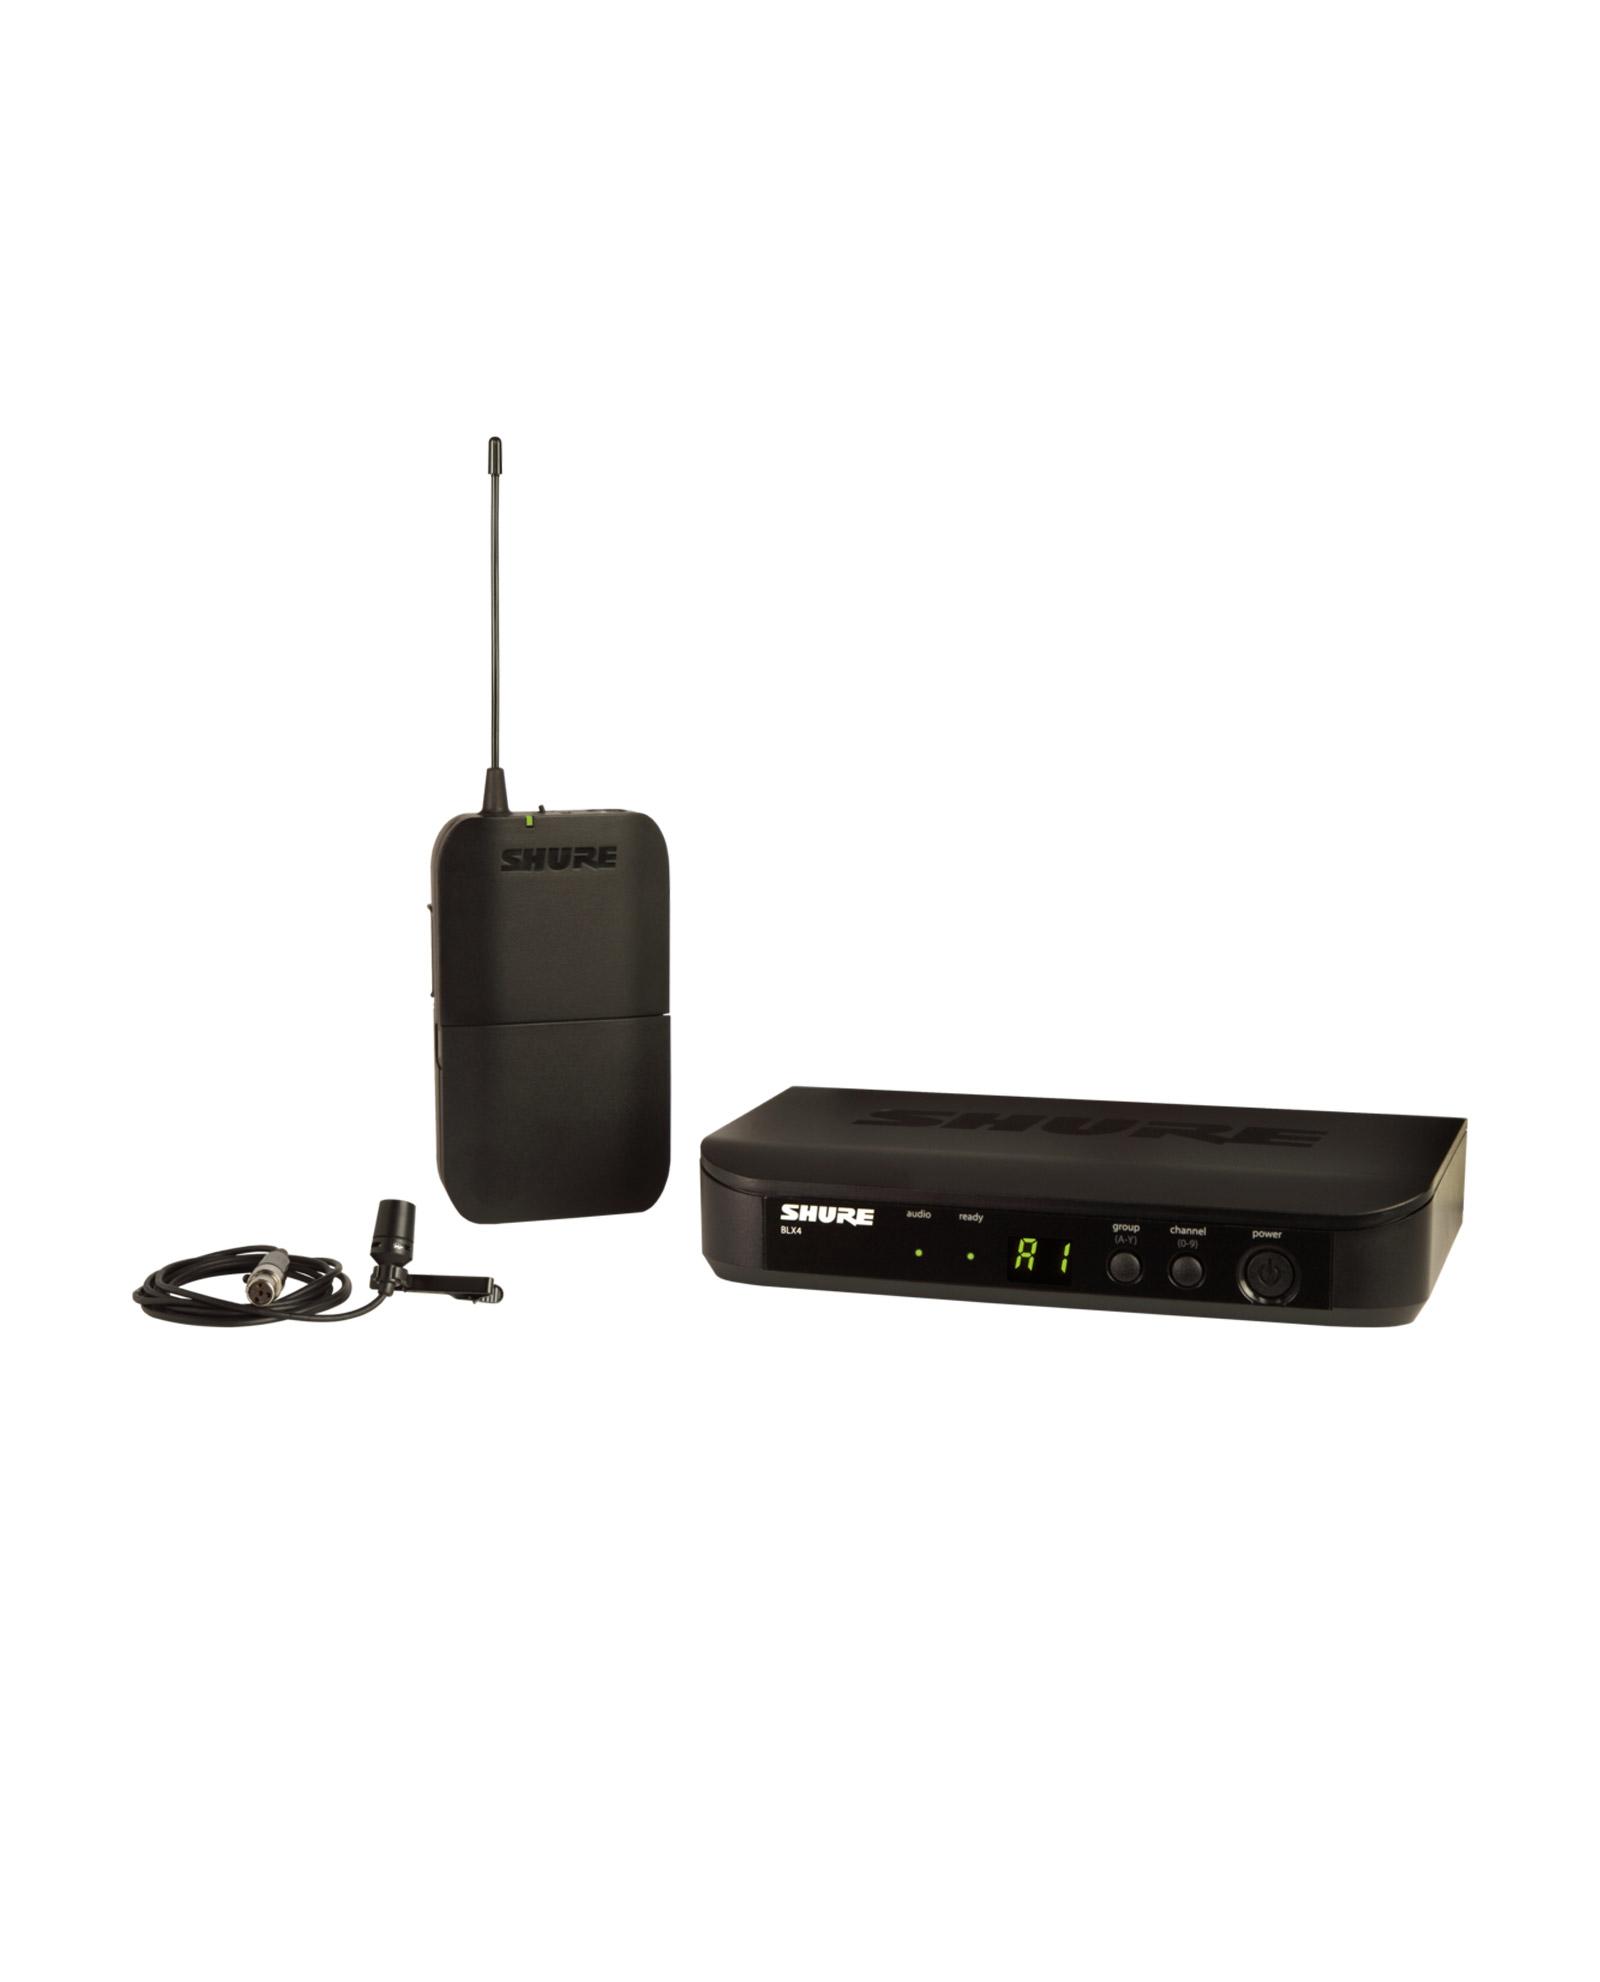 Shure Blx14 Cvl Wireless Presenter System With Cvl Lavalier Microphone 1